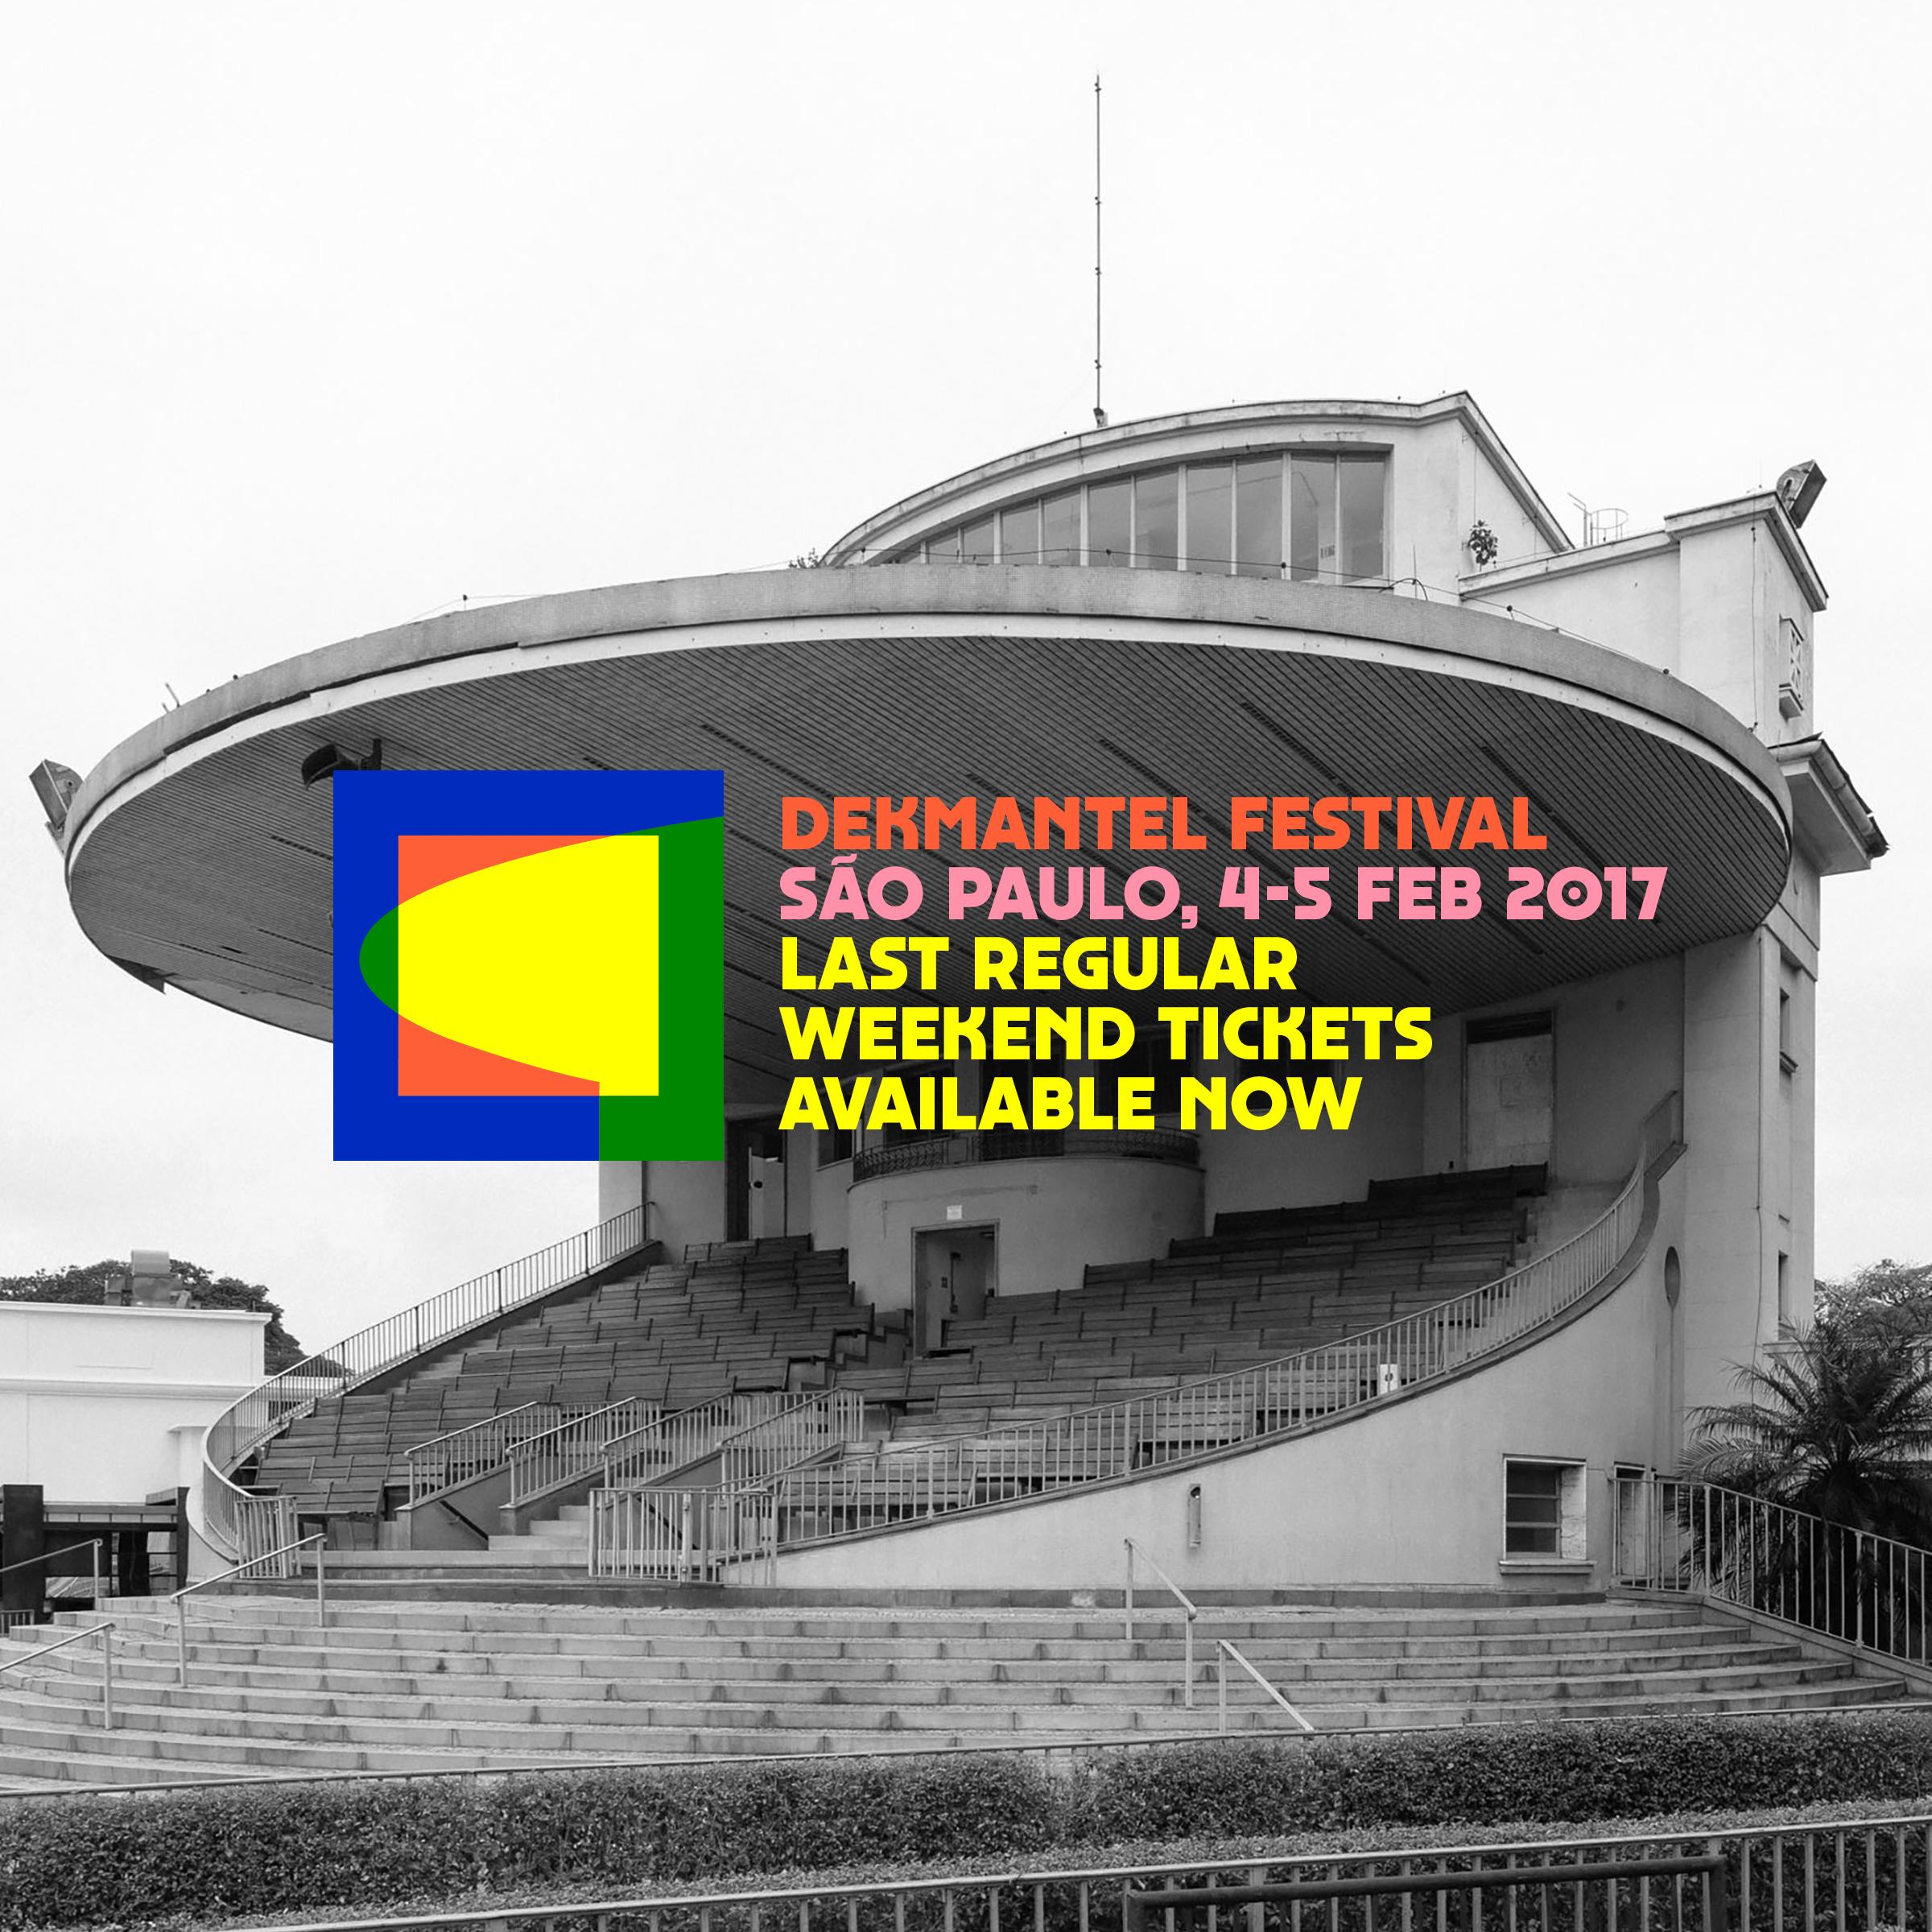 studio_colorado-dekmantel_sao_paulo17-niemeyer